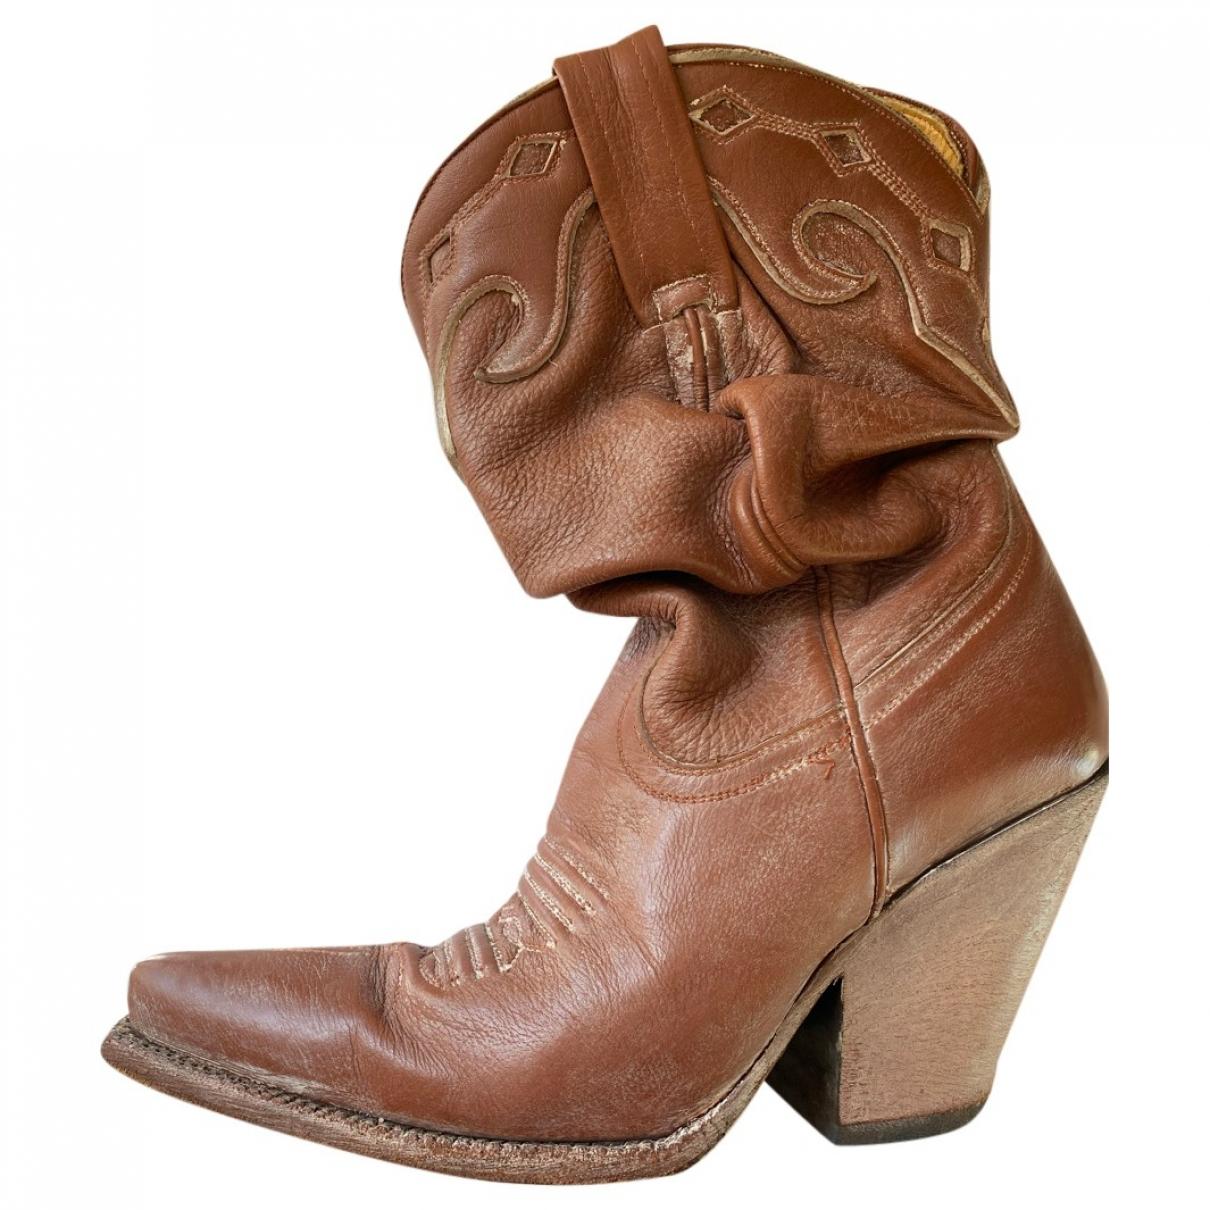 Jean Paul Gaultier \N Camel Leather Ankle boots for Women 36 EU